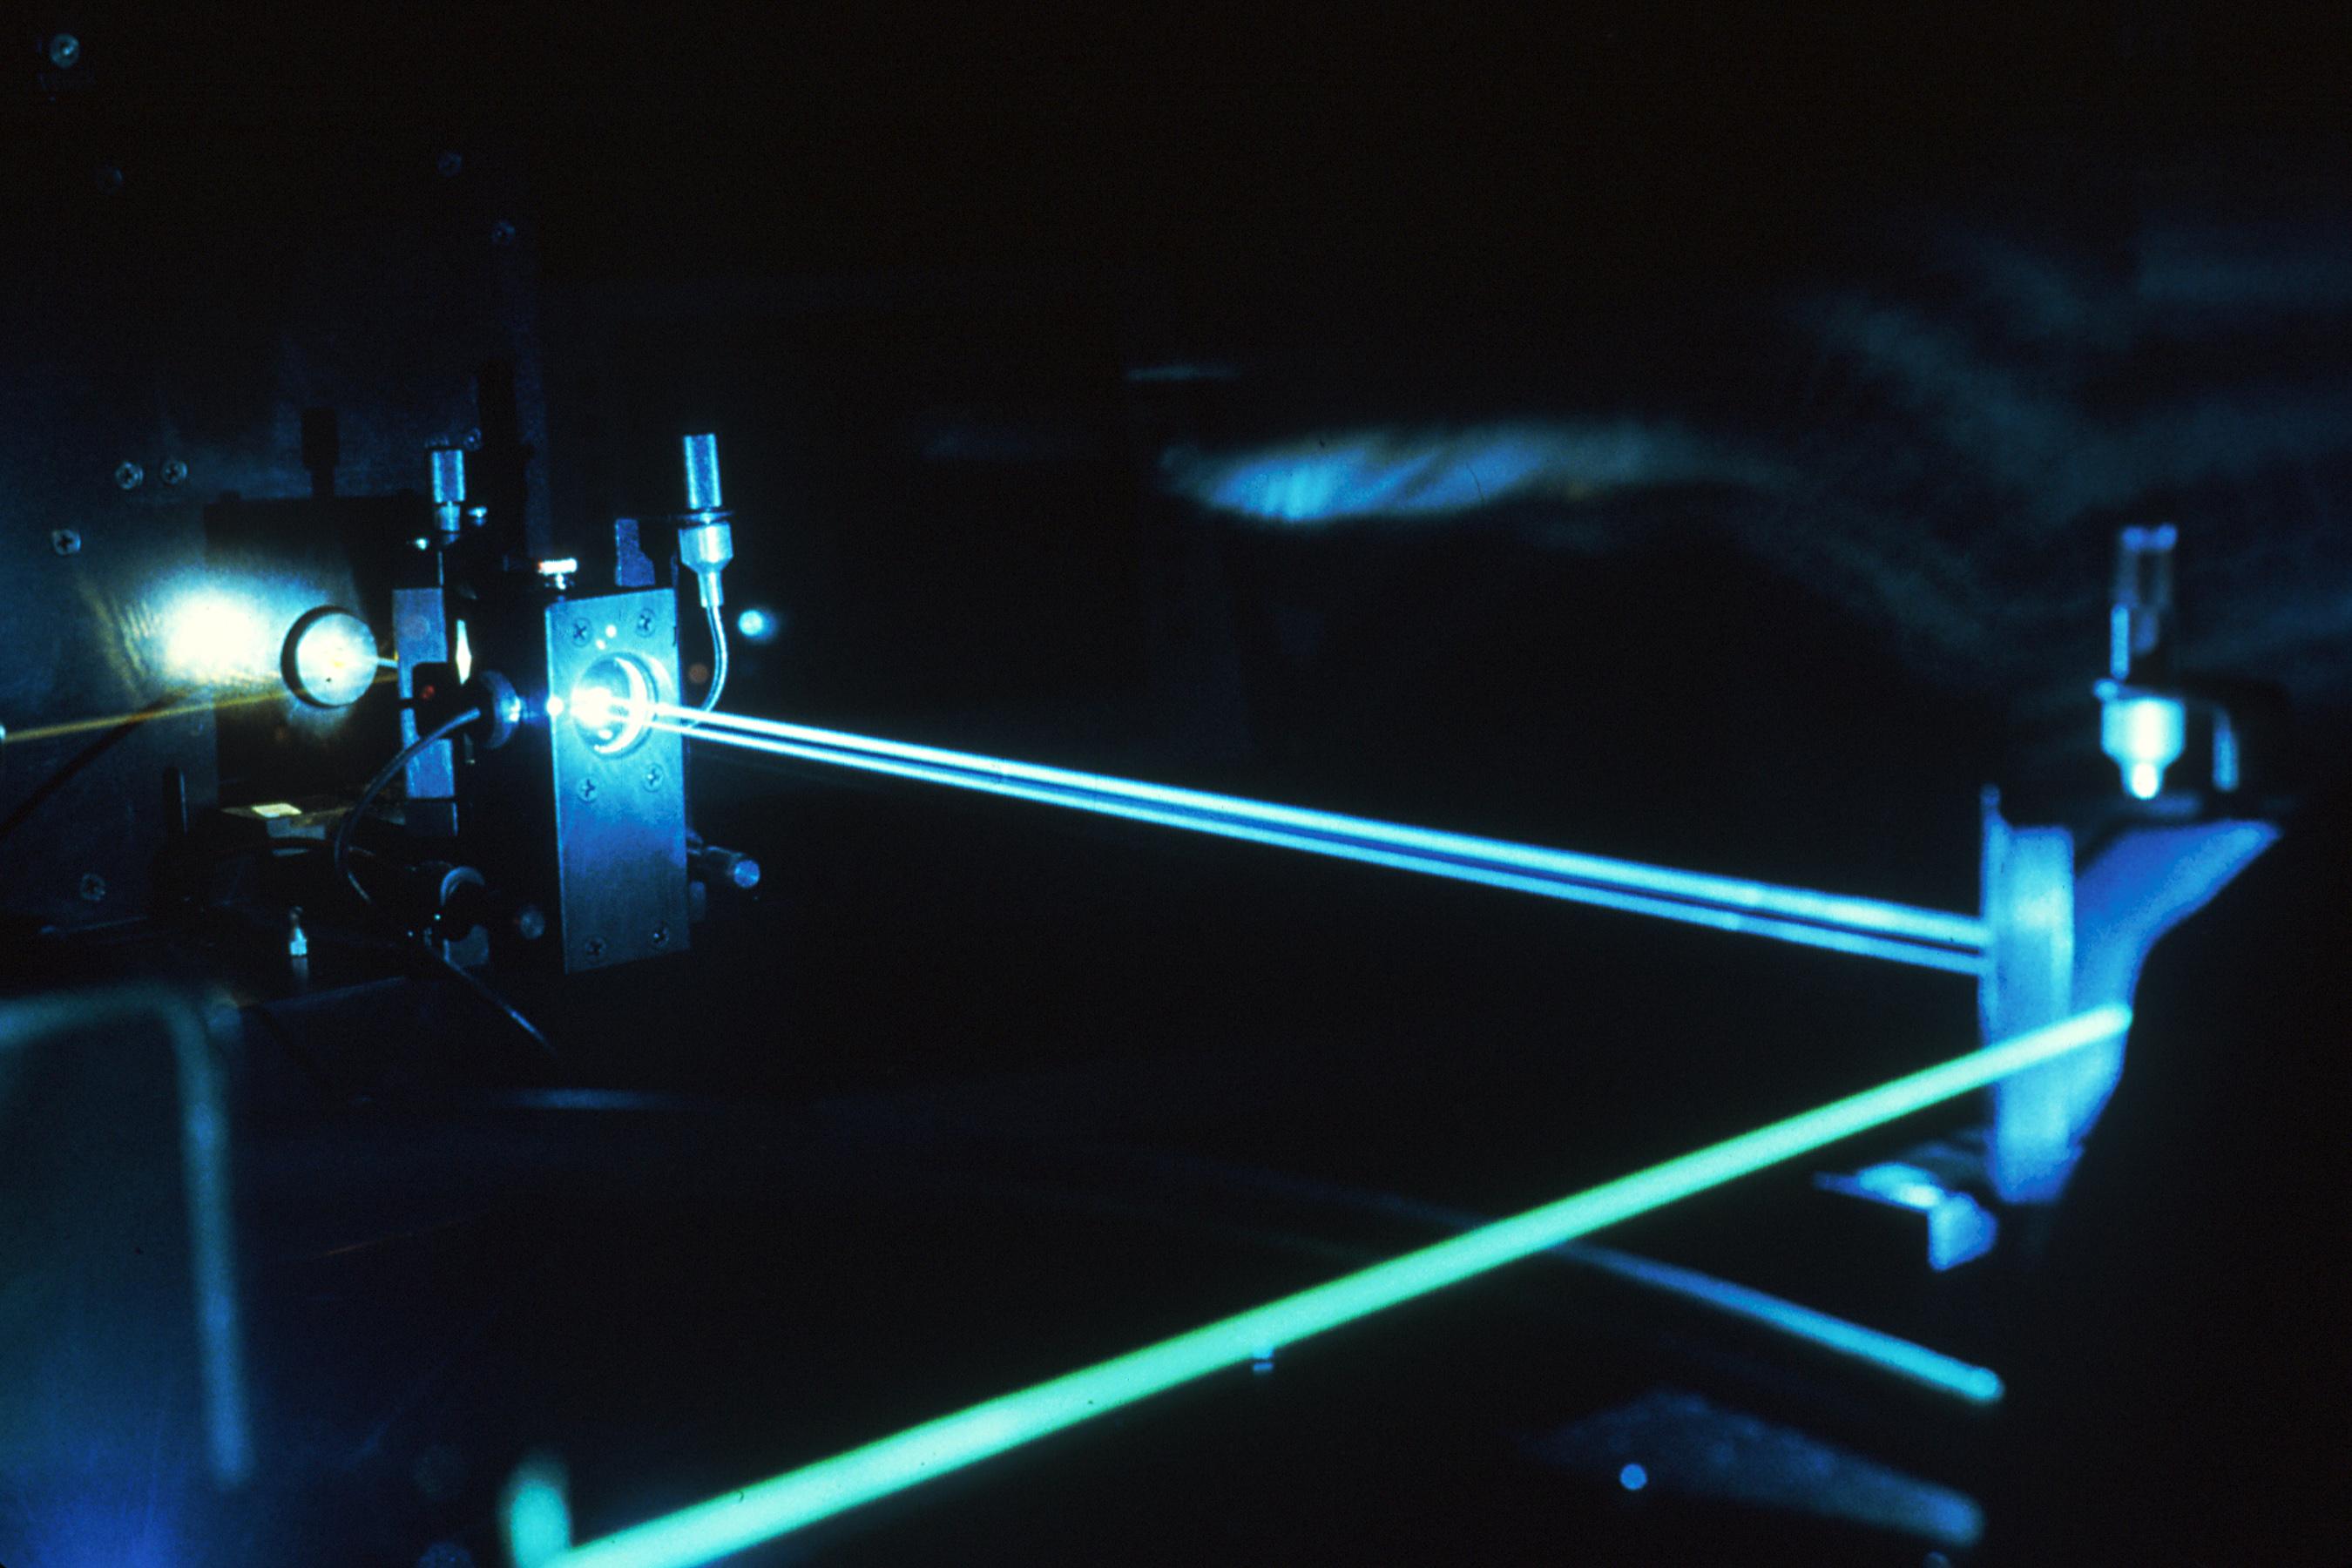 Images of Laser | 2700x1800